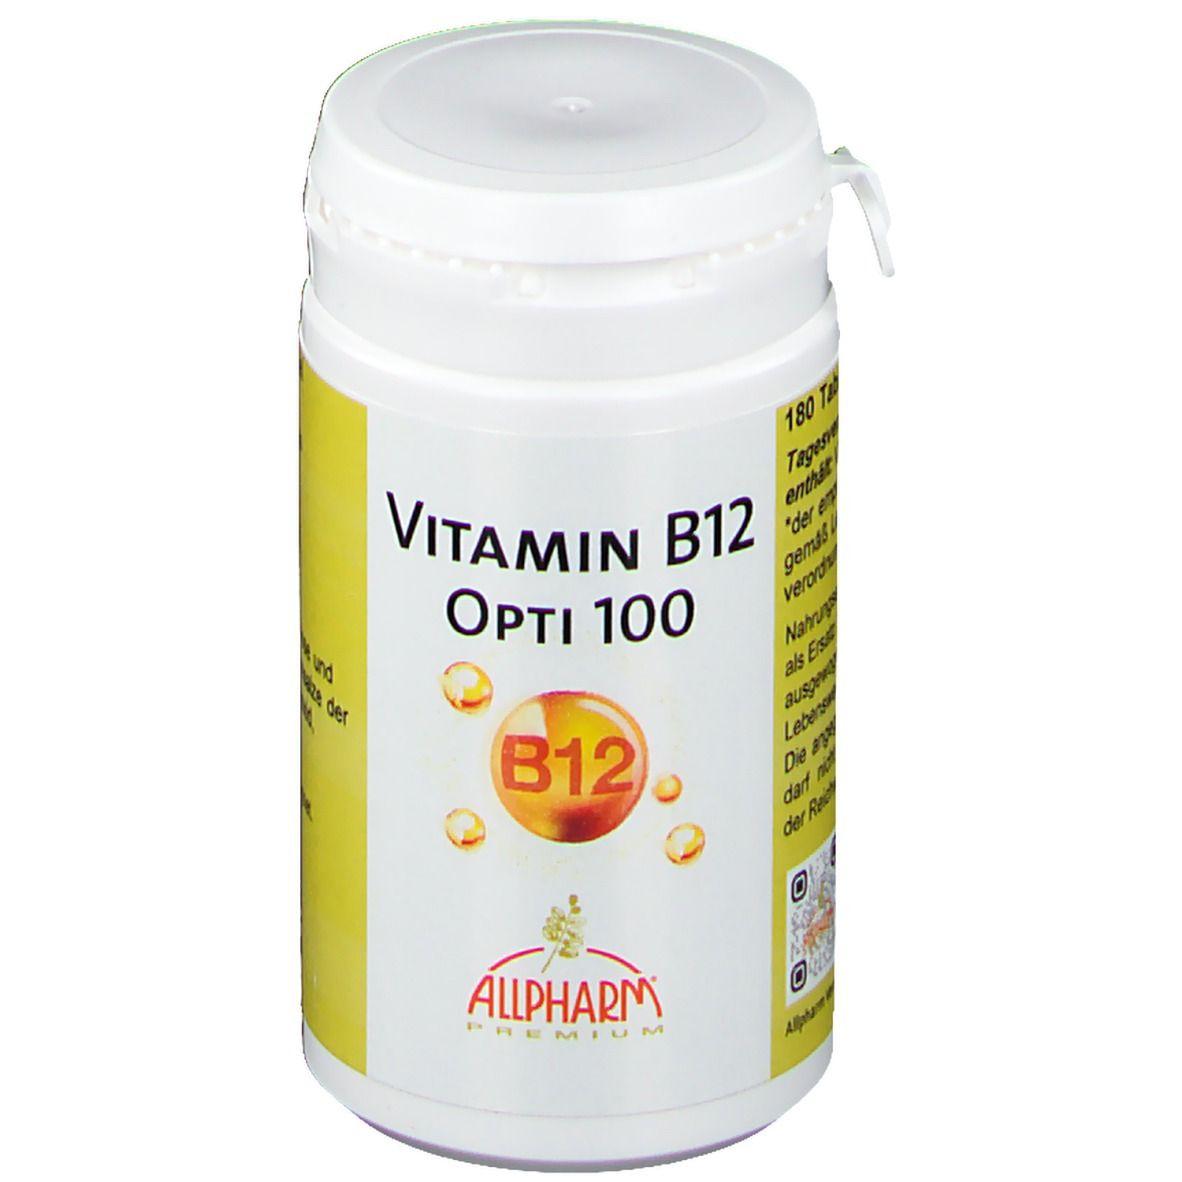 Vitamin B12 Opti 100